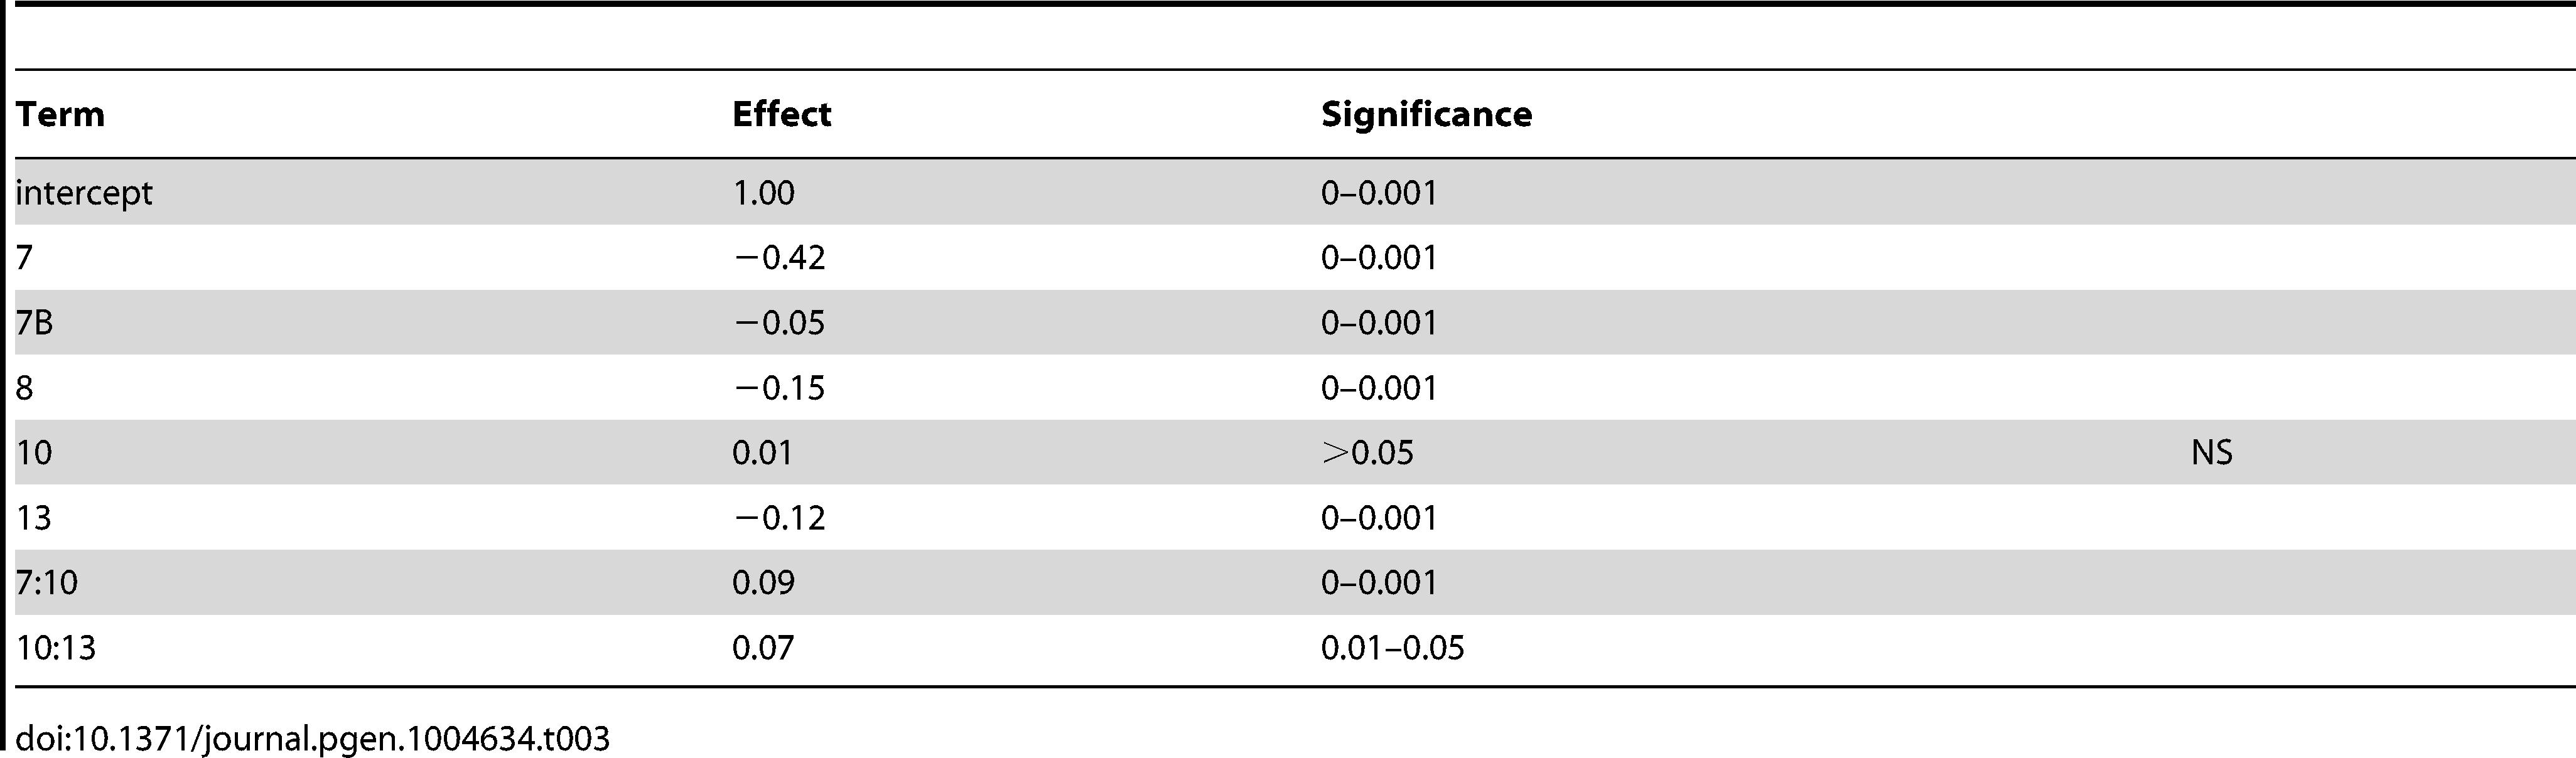 Cross 2 linear model coefficients using nearest marker to QTL apex.